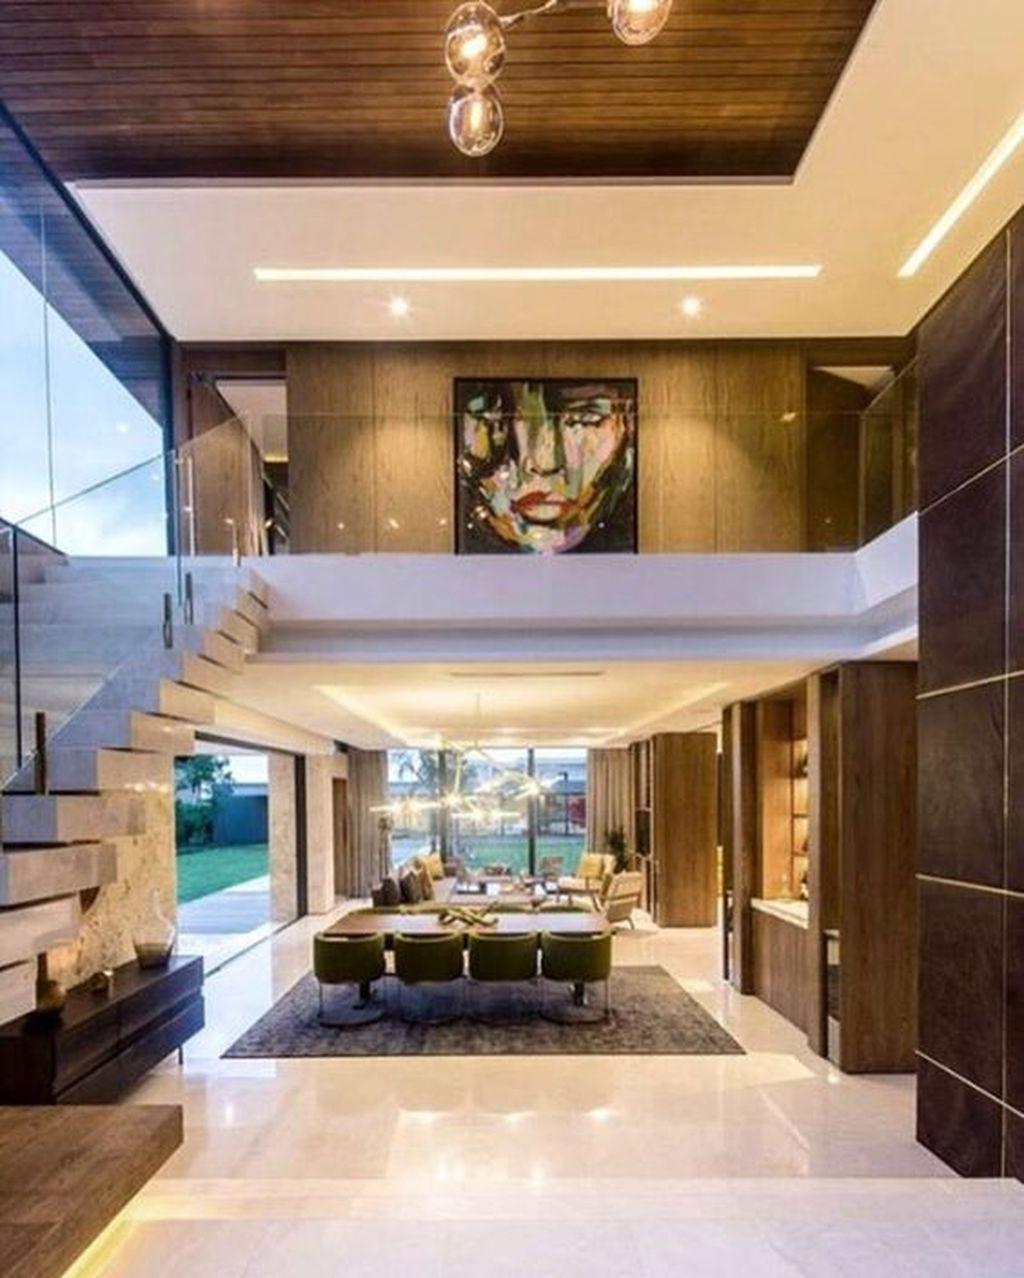 stunning modern house design interior ideas also contemporary by rdm general contractors homeadore dream rh pinterest